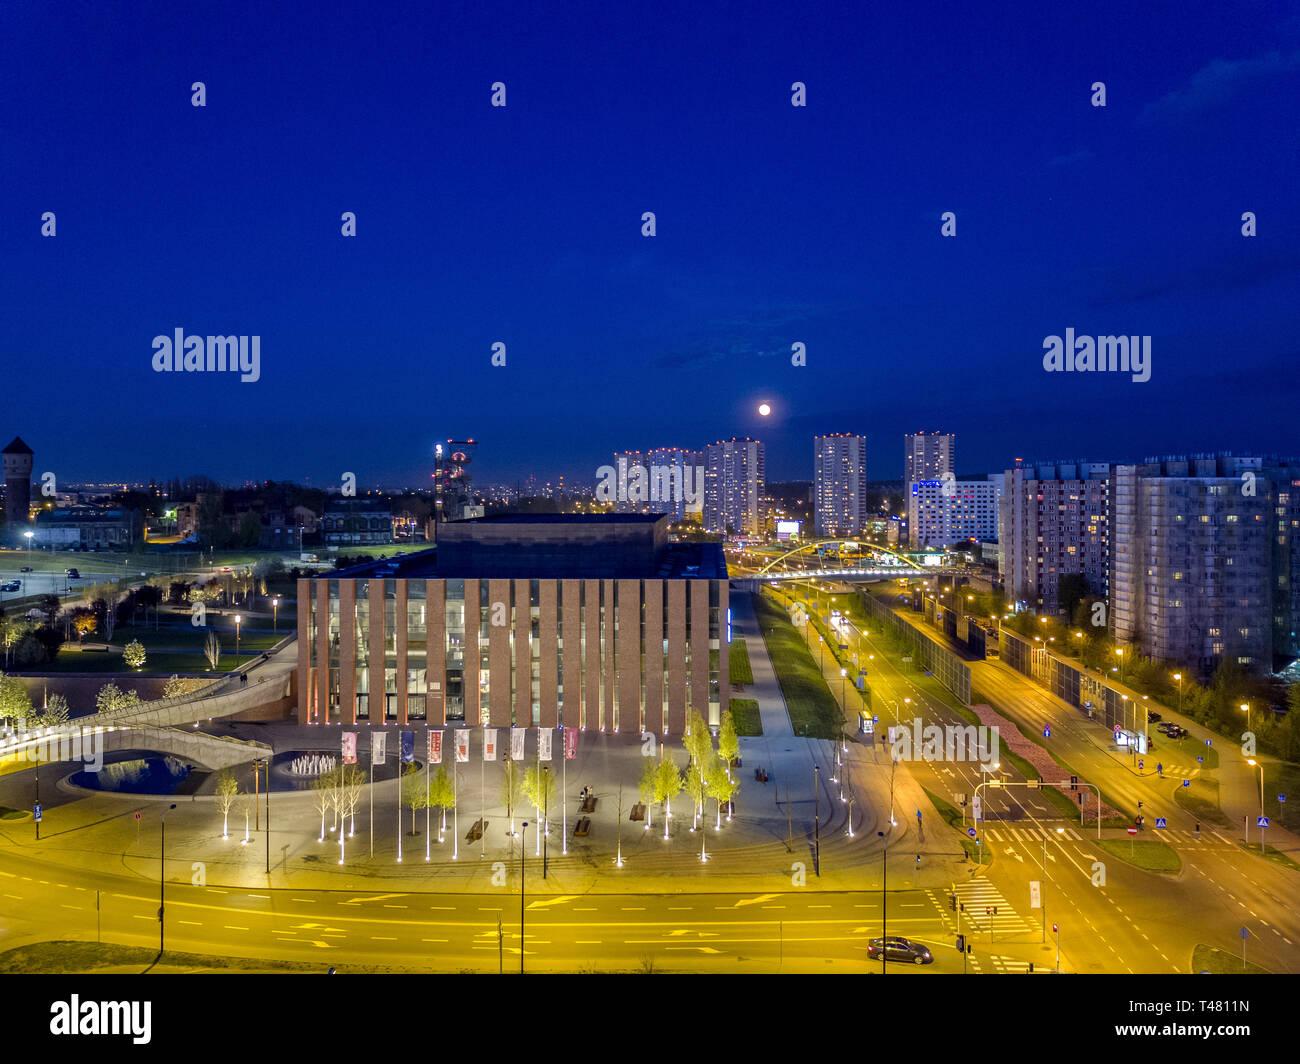 The seat of the NOSPR (the Polish National Radio Symphony Orchestra), Katowice, Silesia, Poland Stock Photo